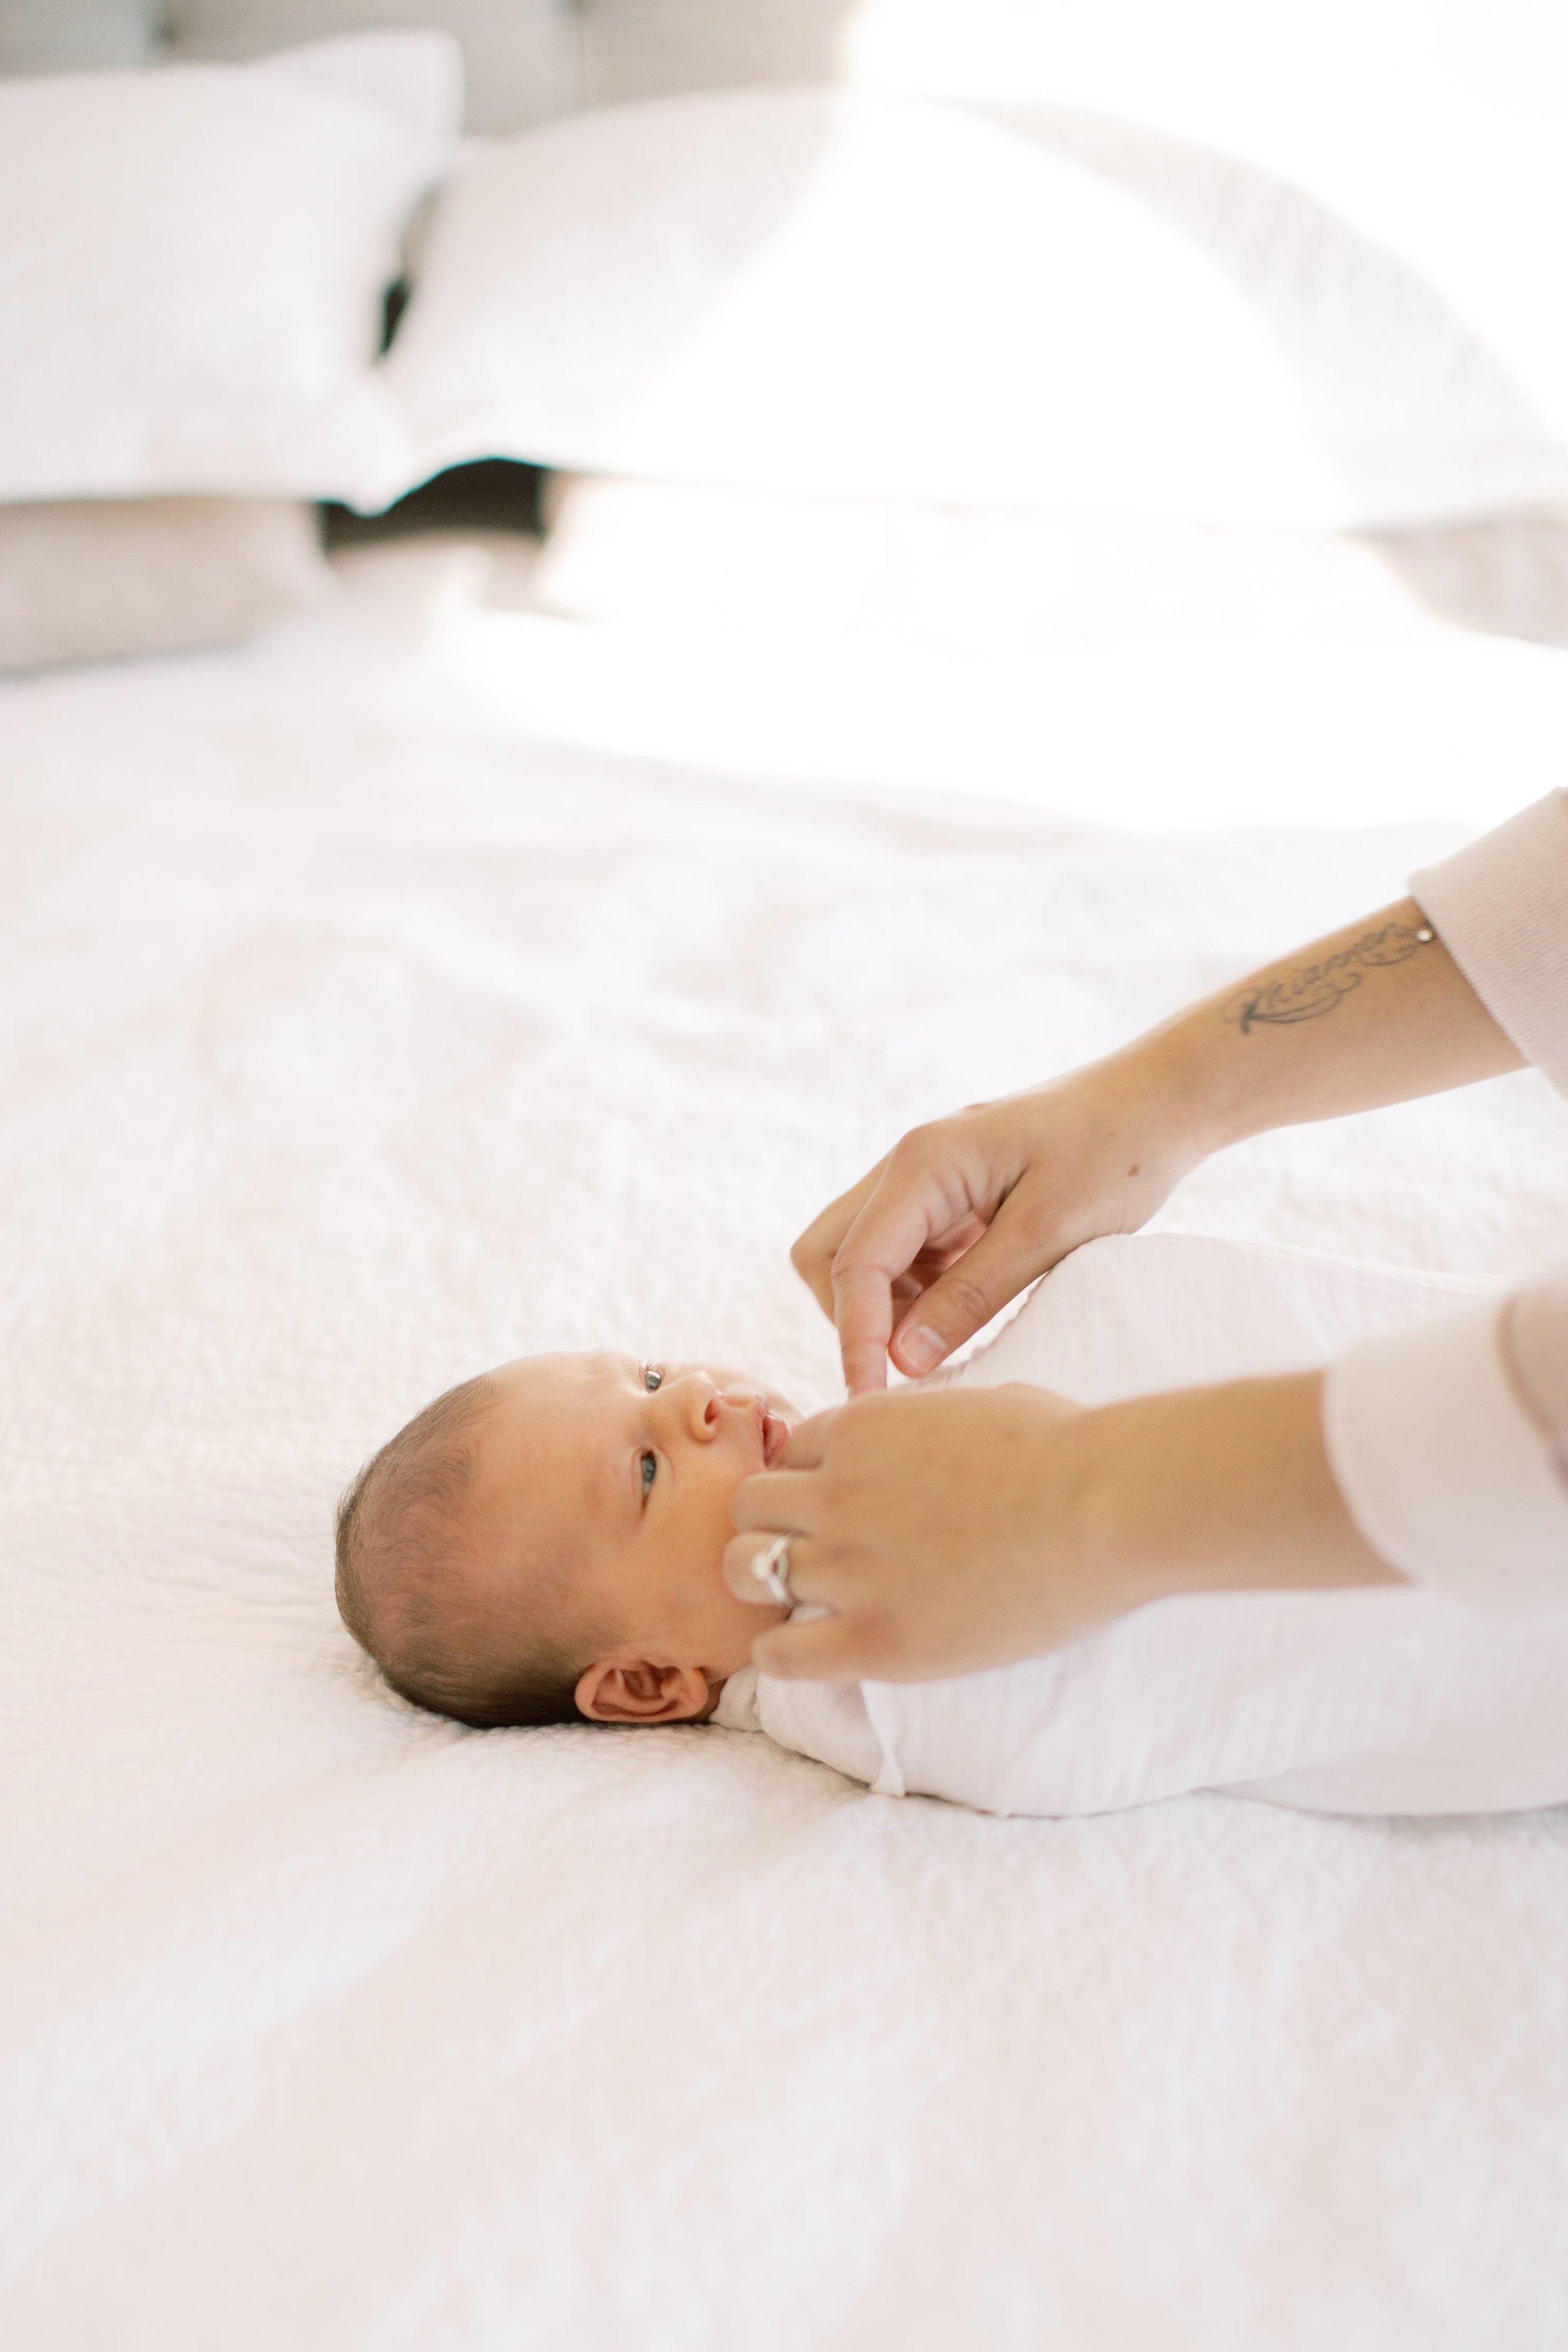 AmeliaClairePhotography_Mia_Newborn-1-100.jpeg